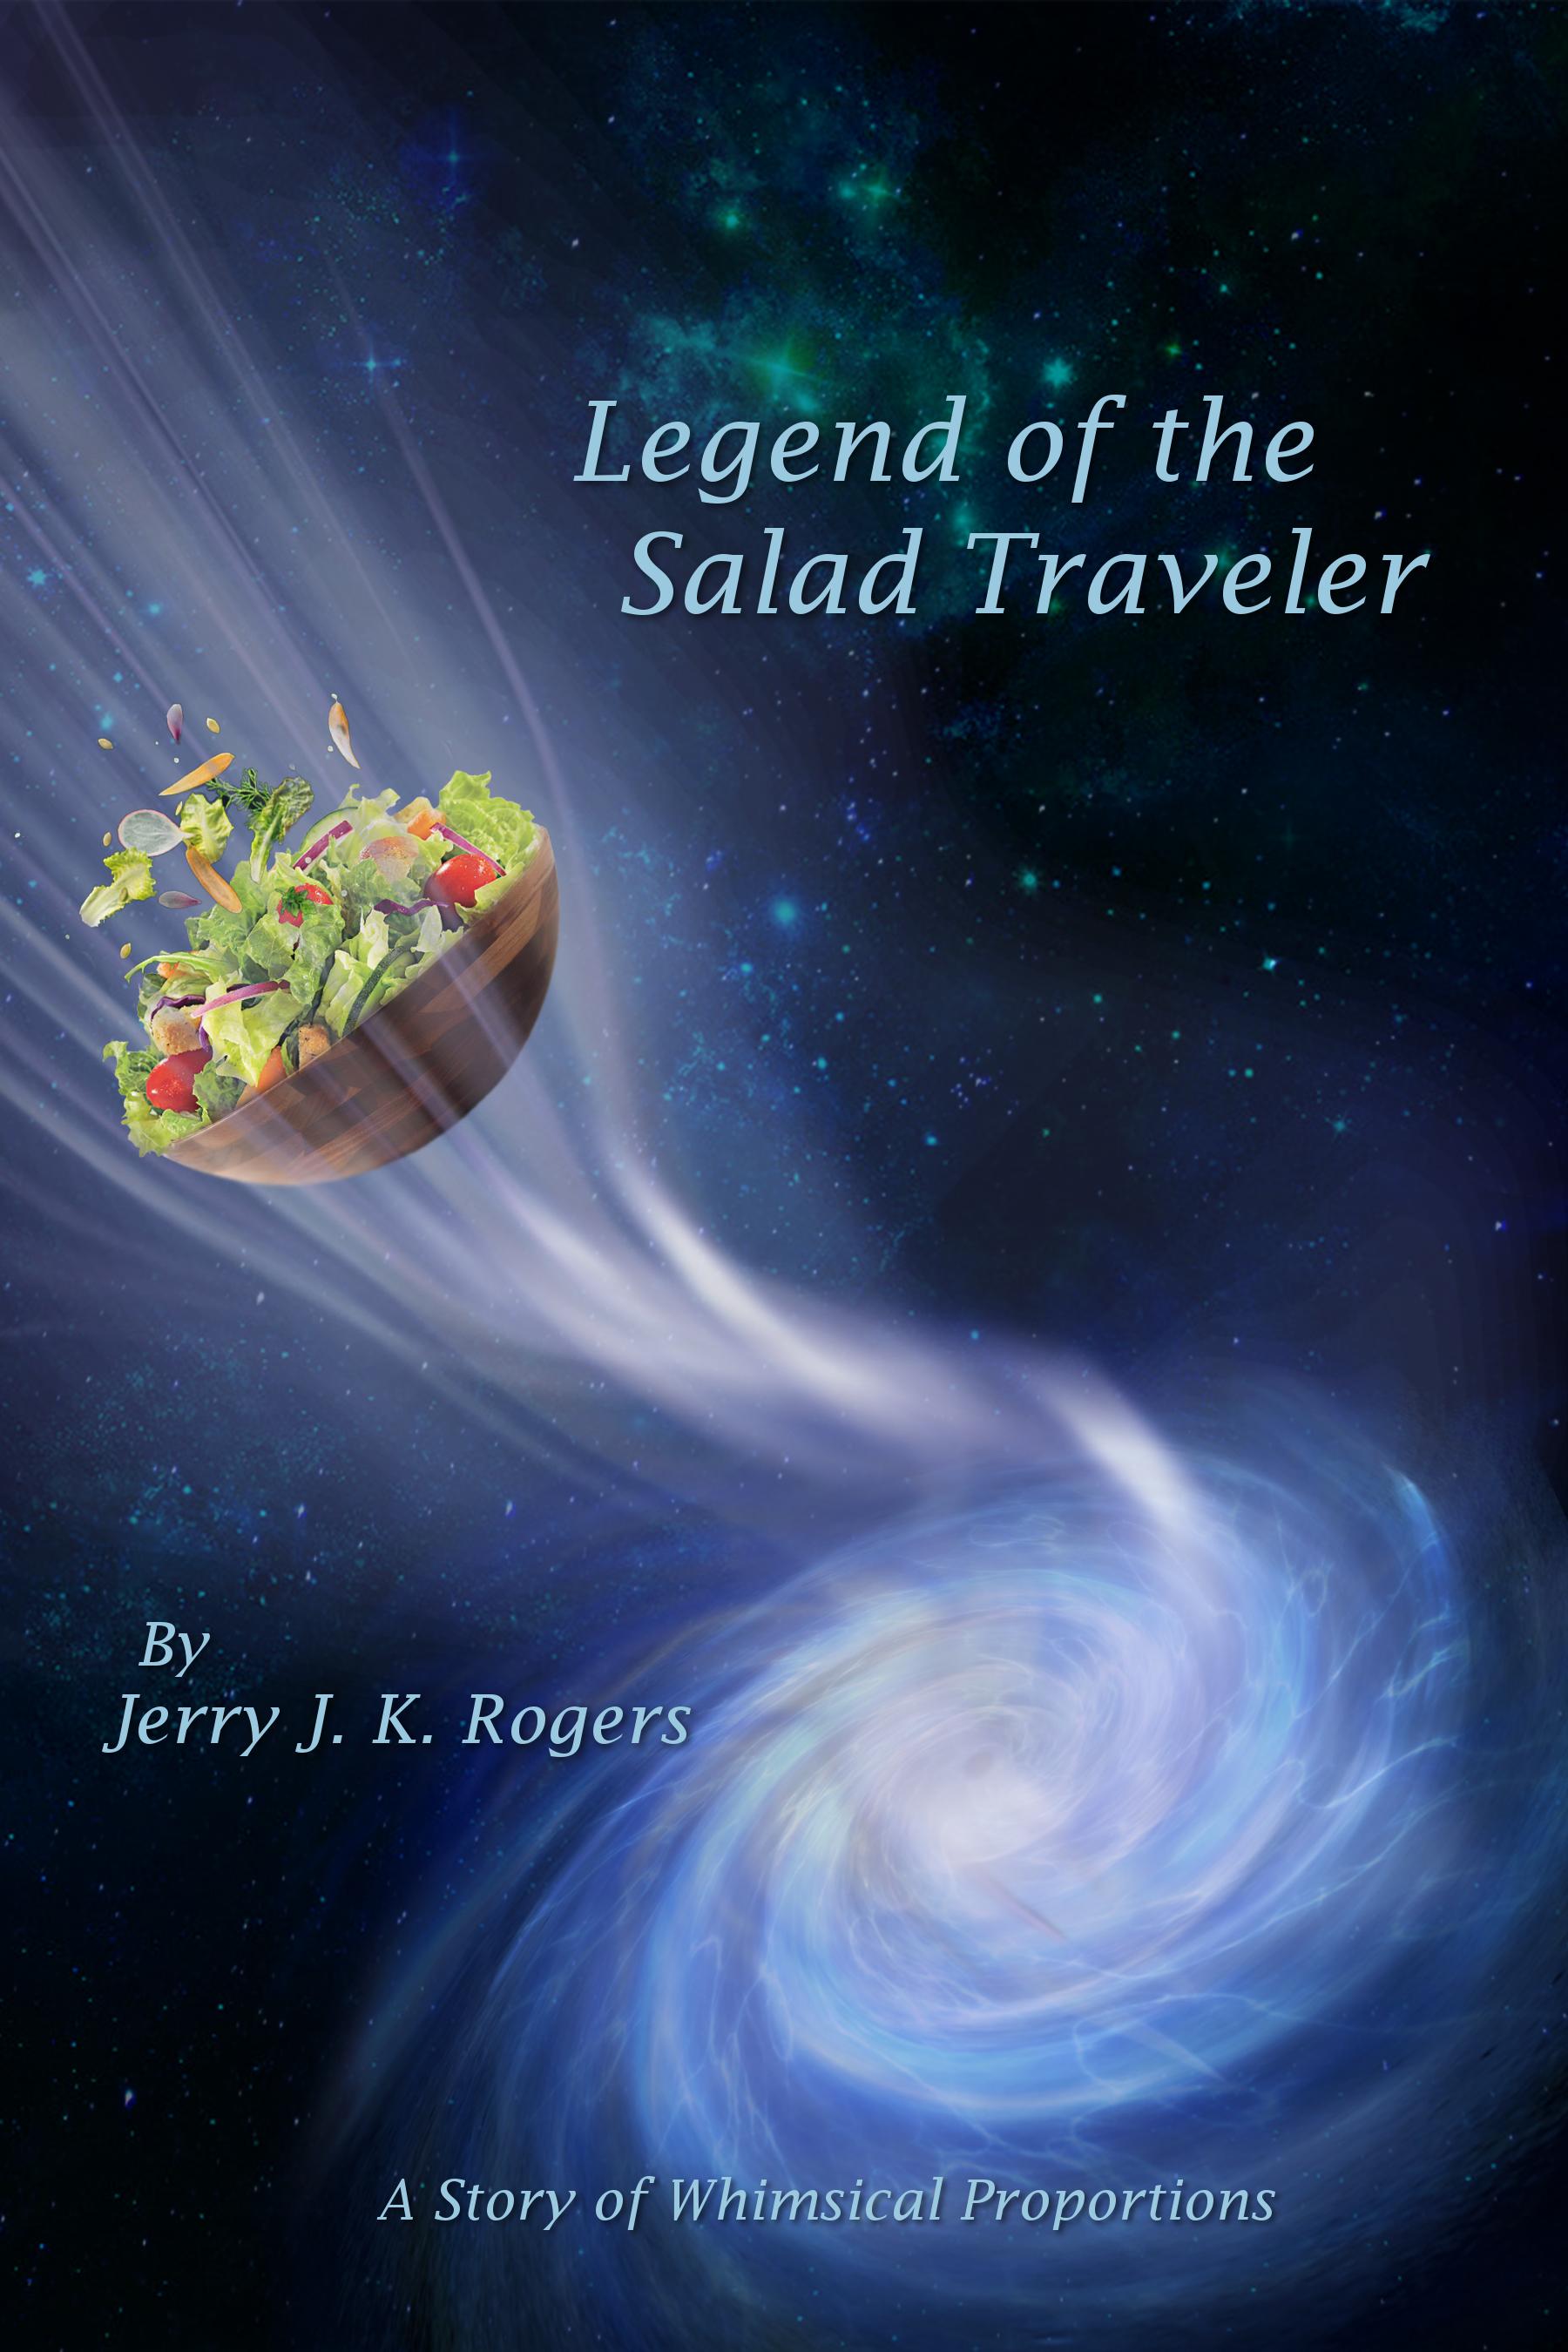 Legend of the Salad Traveler Cover Art (Design created by Christian Vazquez)